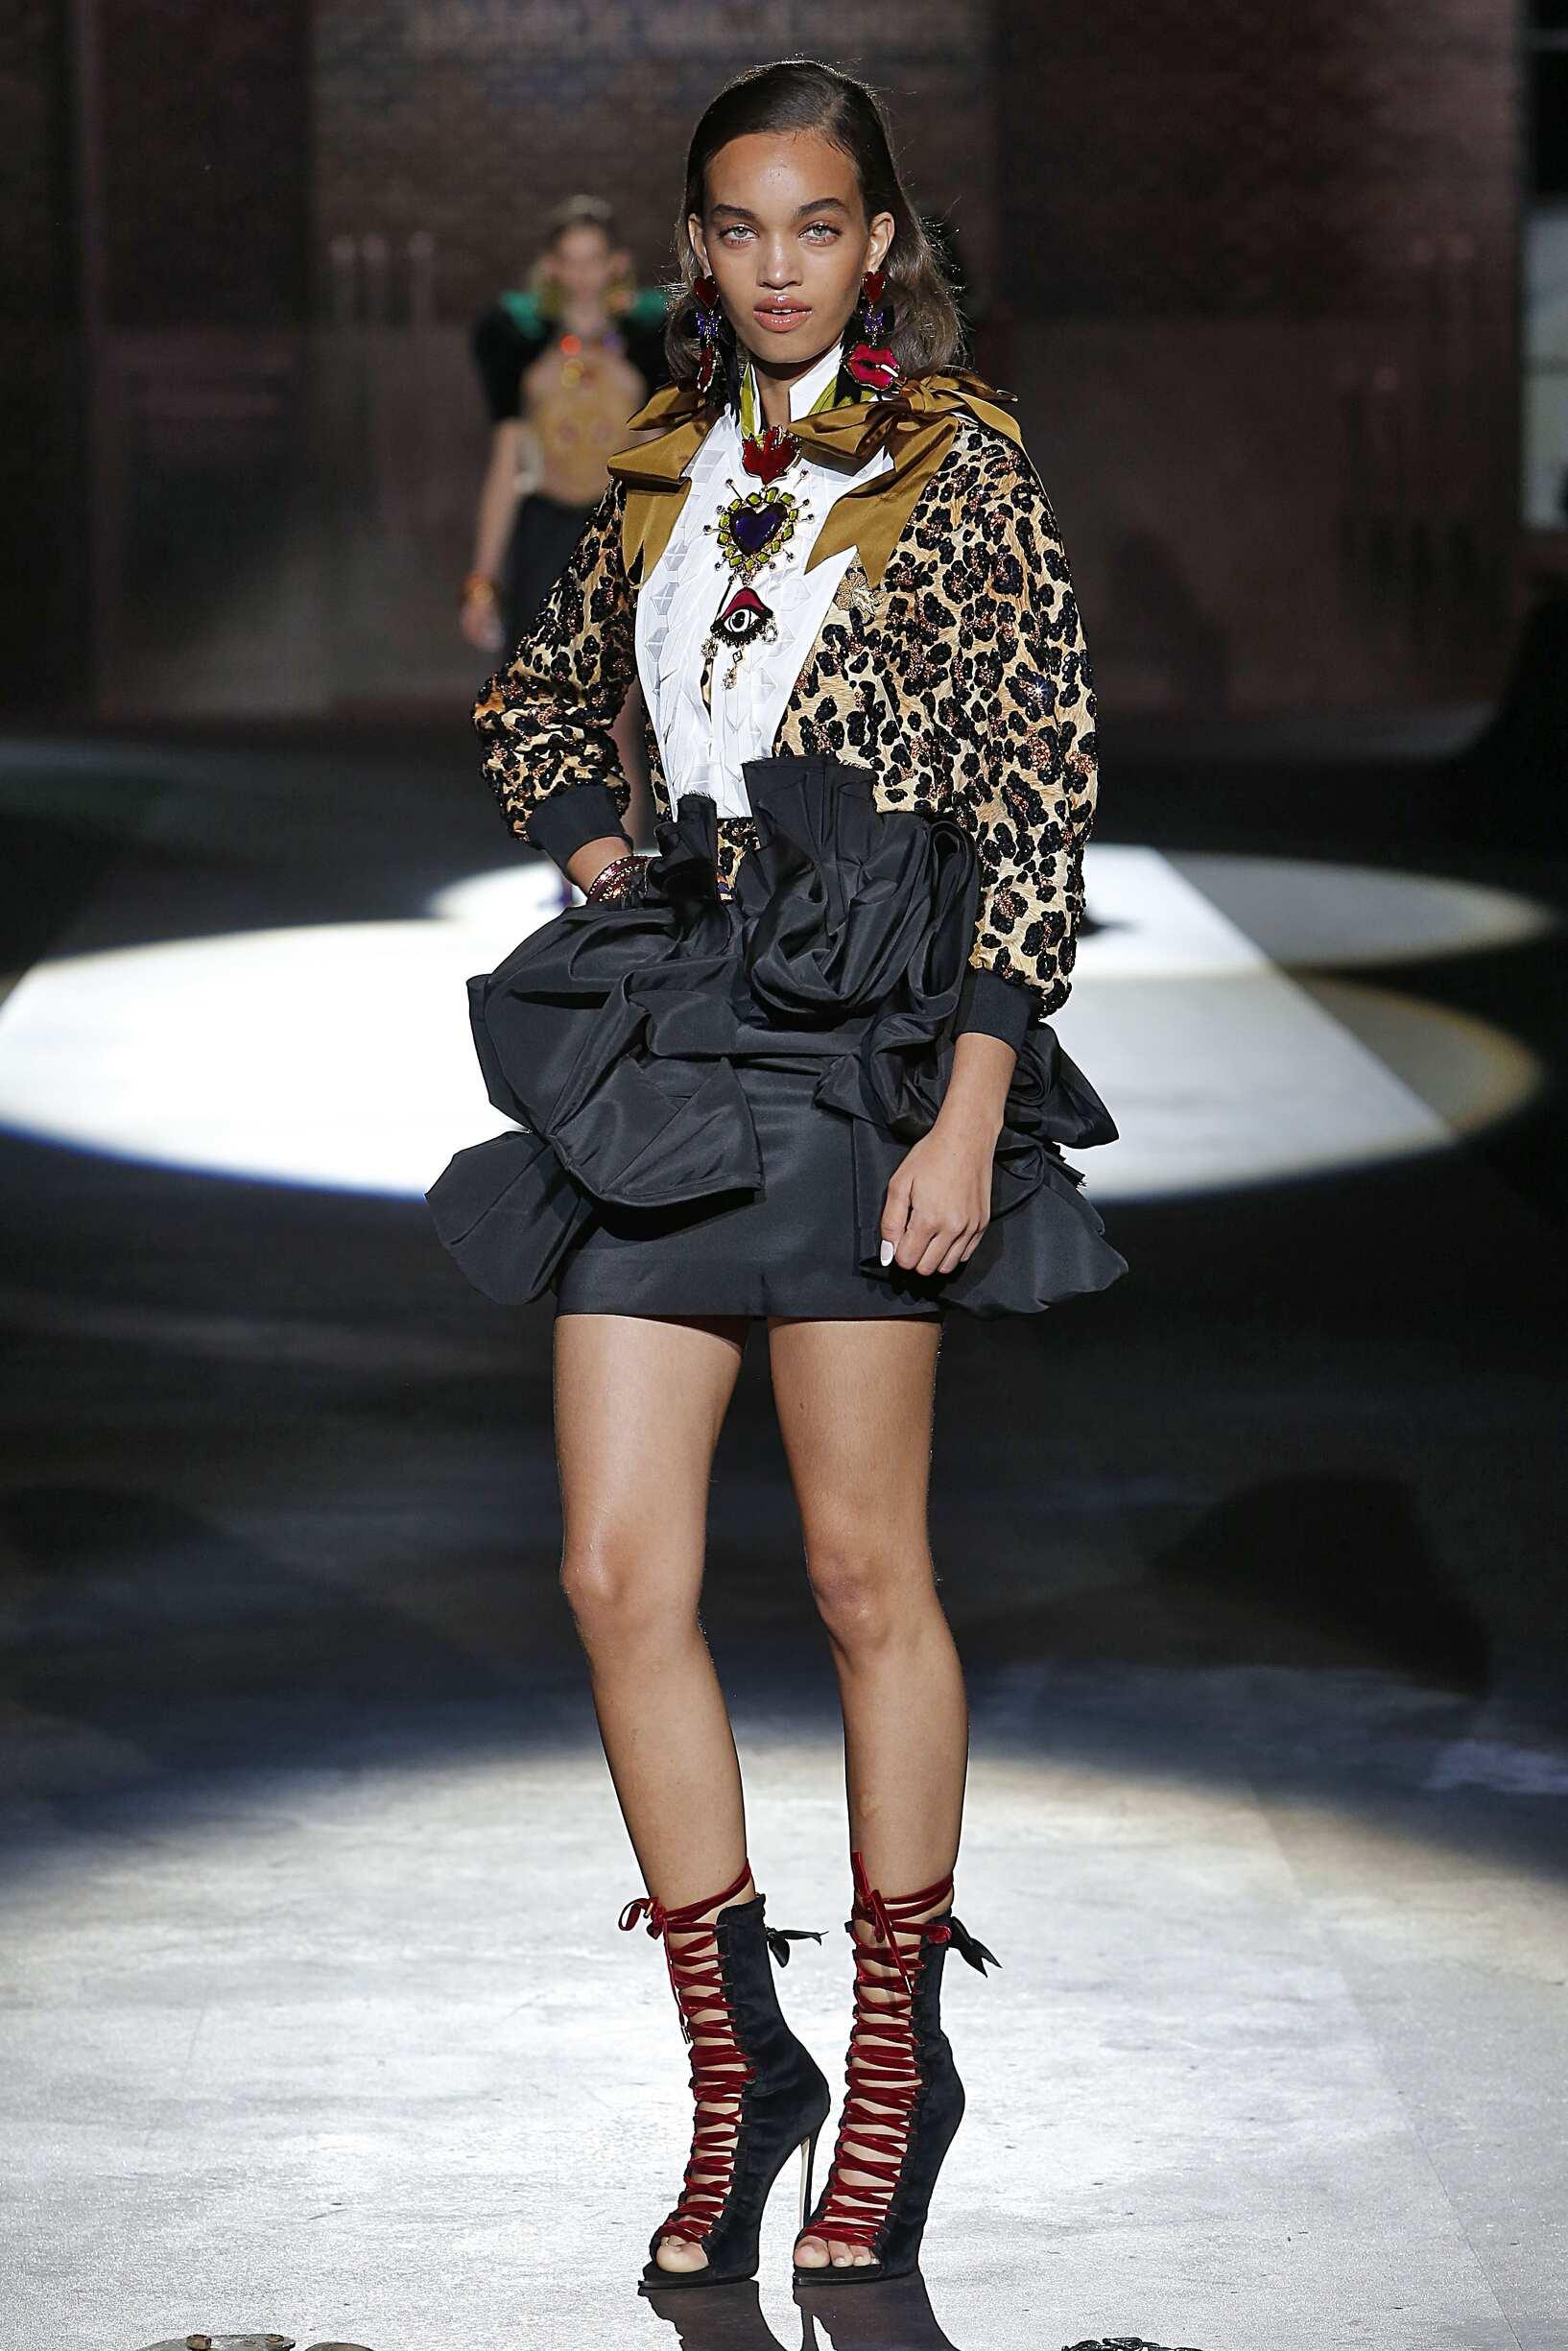 Fashion Woman Model Dsquared2 Catwalk